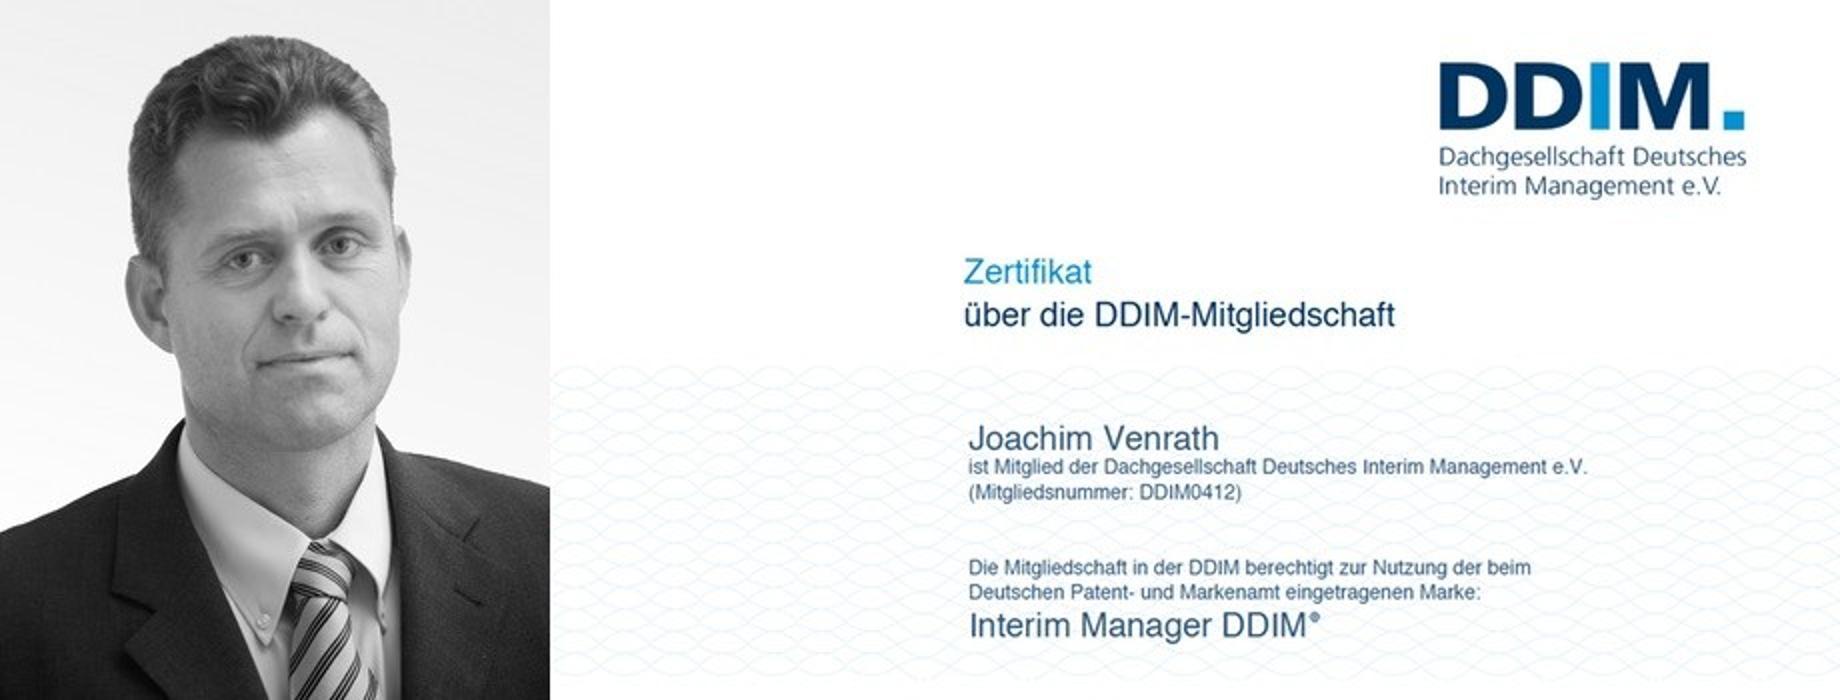 abclocal.alt.text.photo.1 AvioniQ Engineering GmbH abclocal.alt.text.photo.2 Berlin